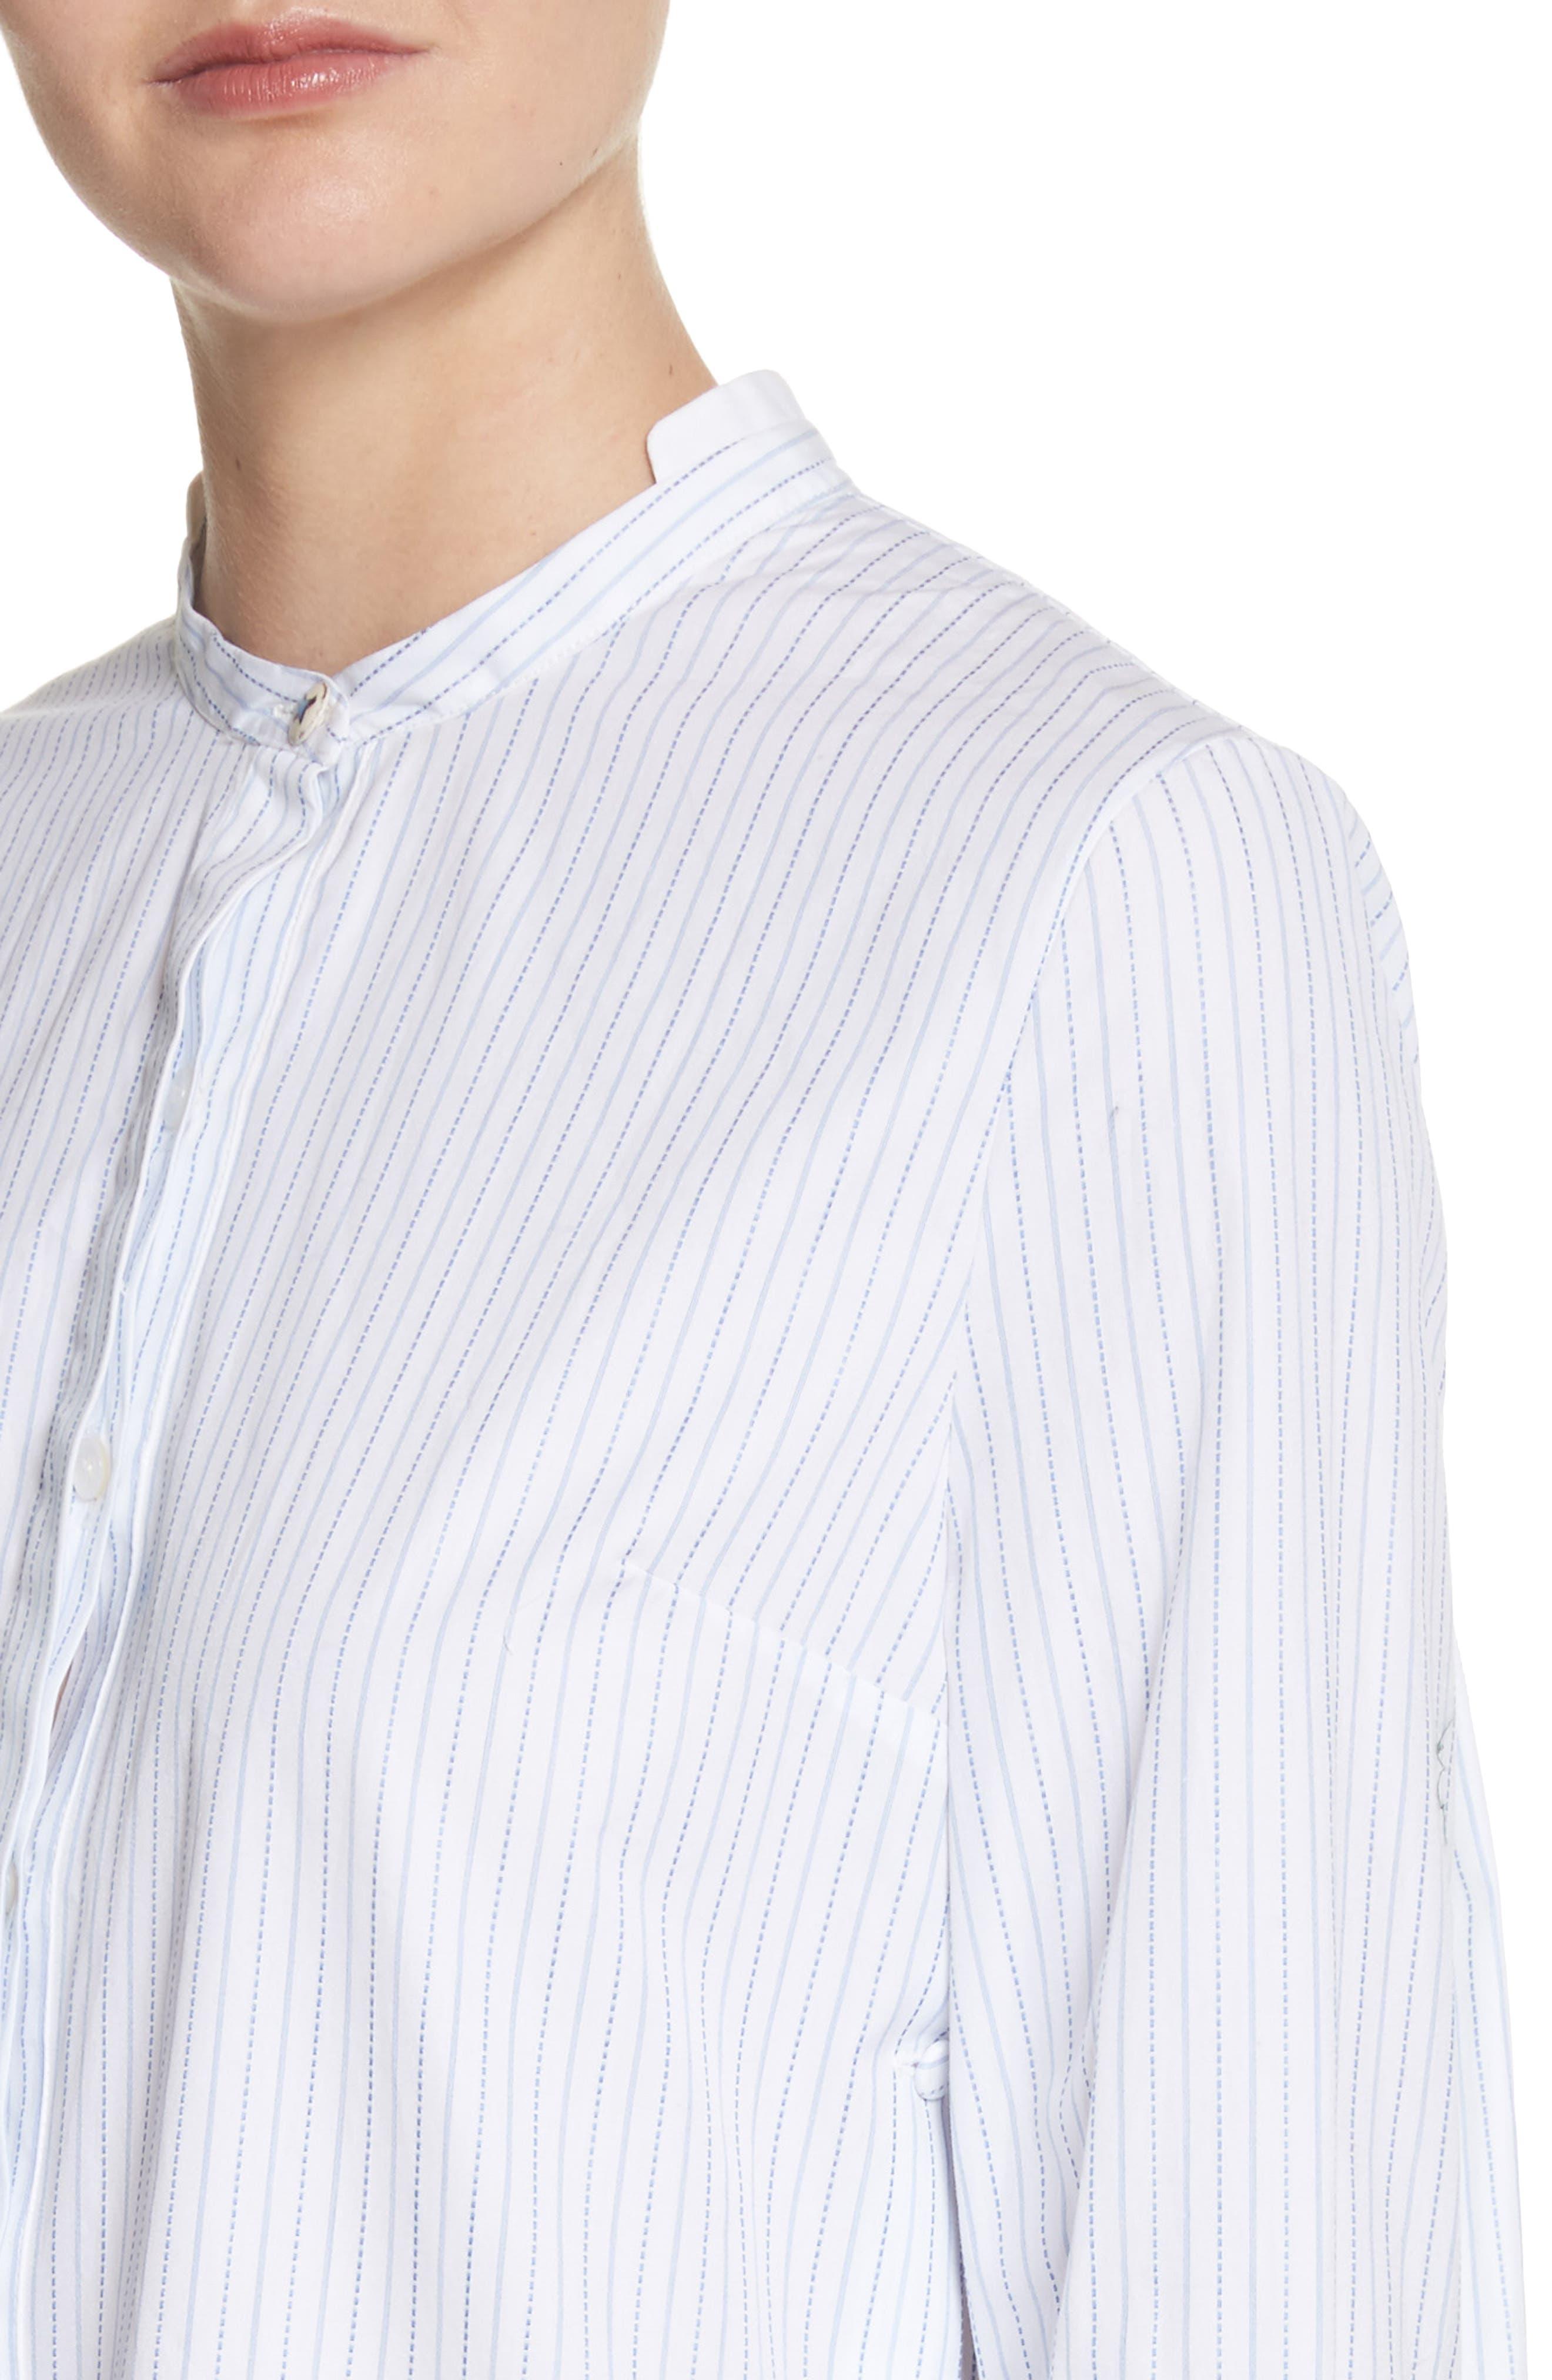 High/Low Stripe Cotton Poplin Shirt,                             Alternate thumbnail 4, color,                             110